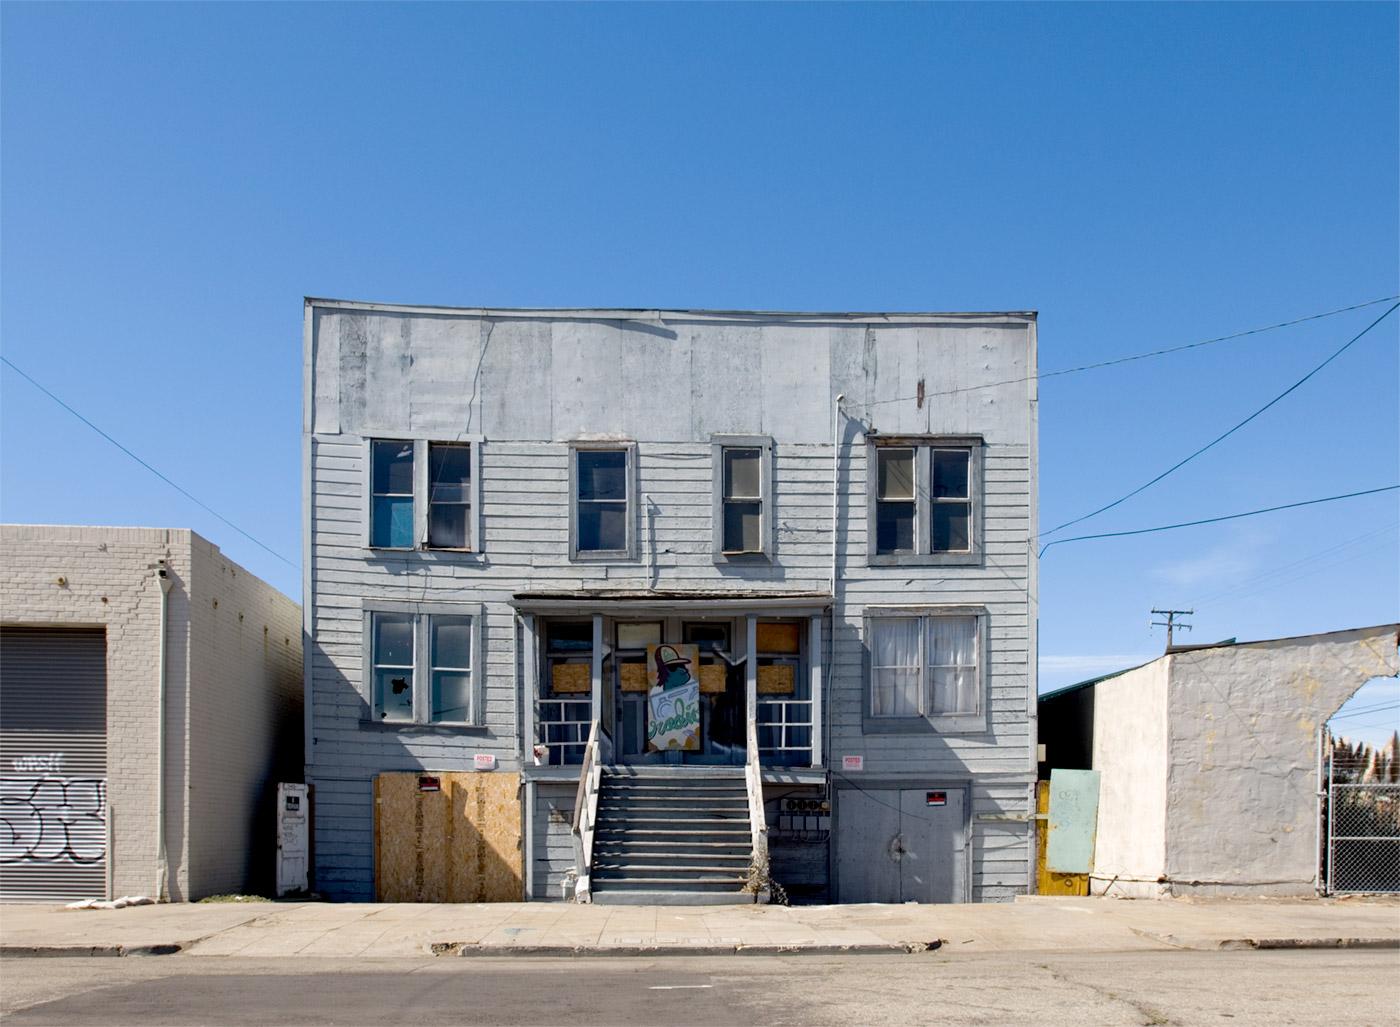 Castro Street, Oakland